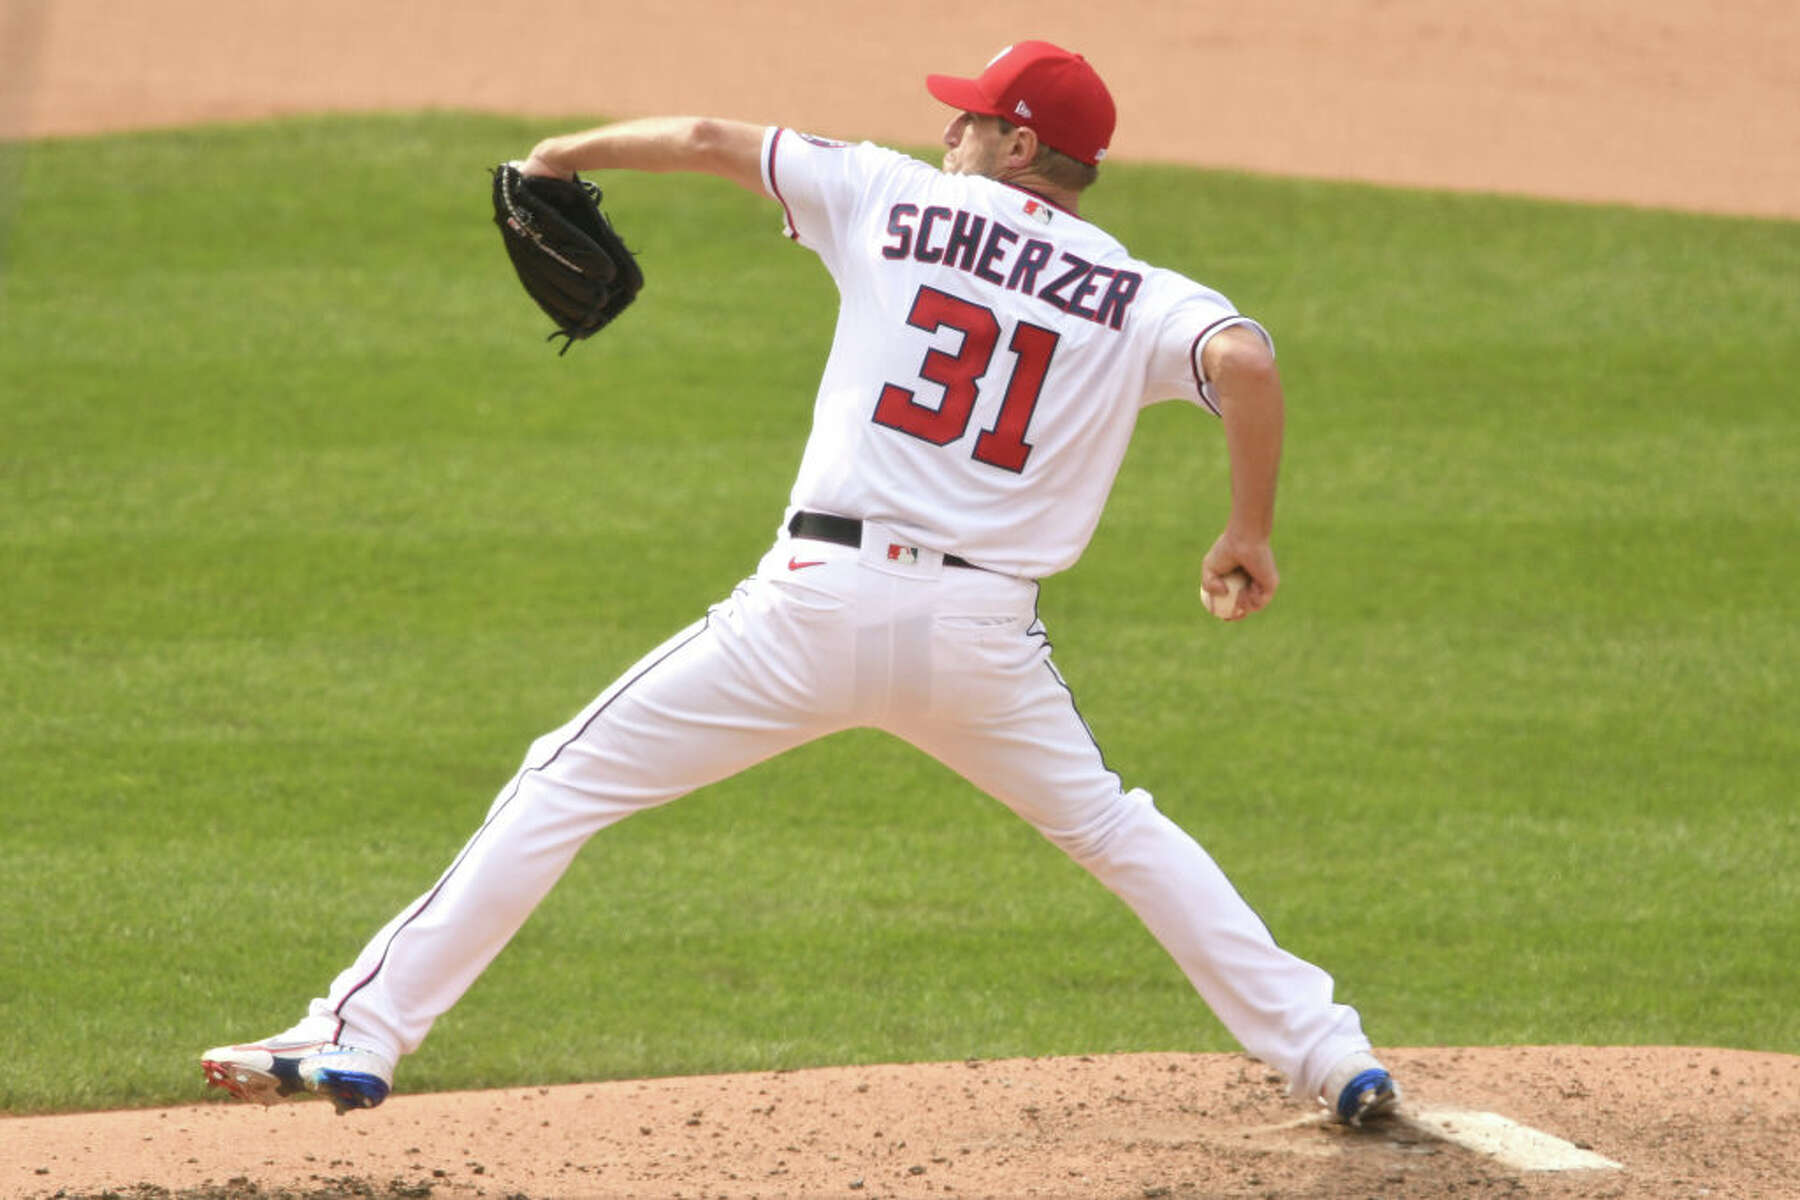 Max Scherzer to Giants? Cy Young winner prefers West Coast destination  ahead of trade deadline